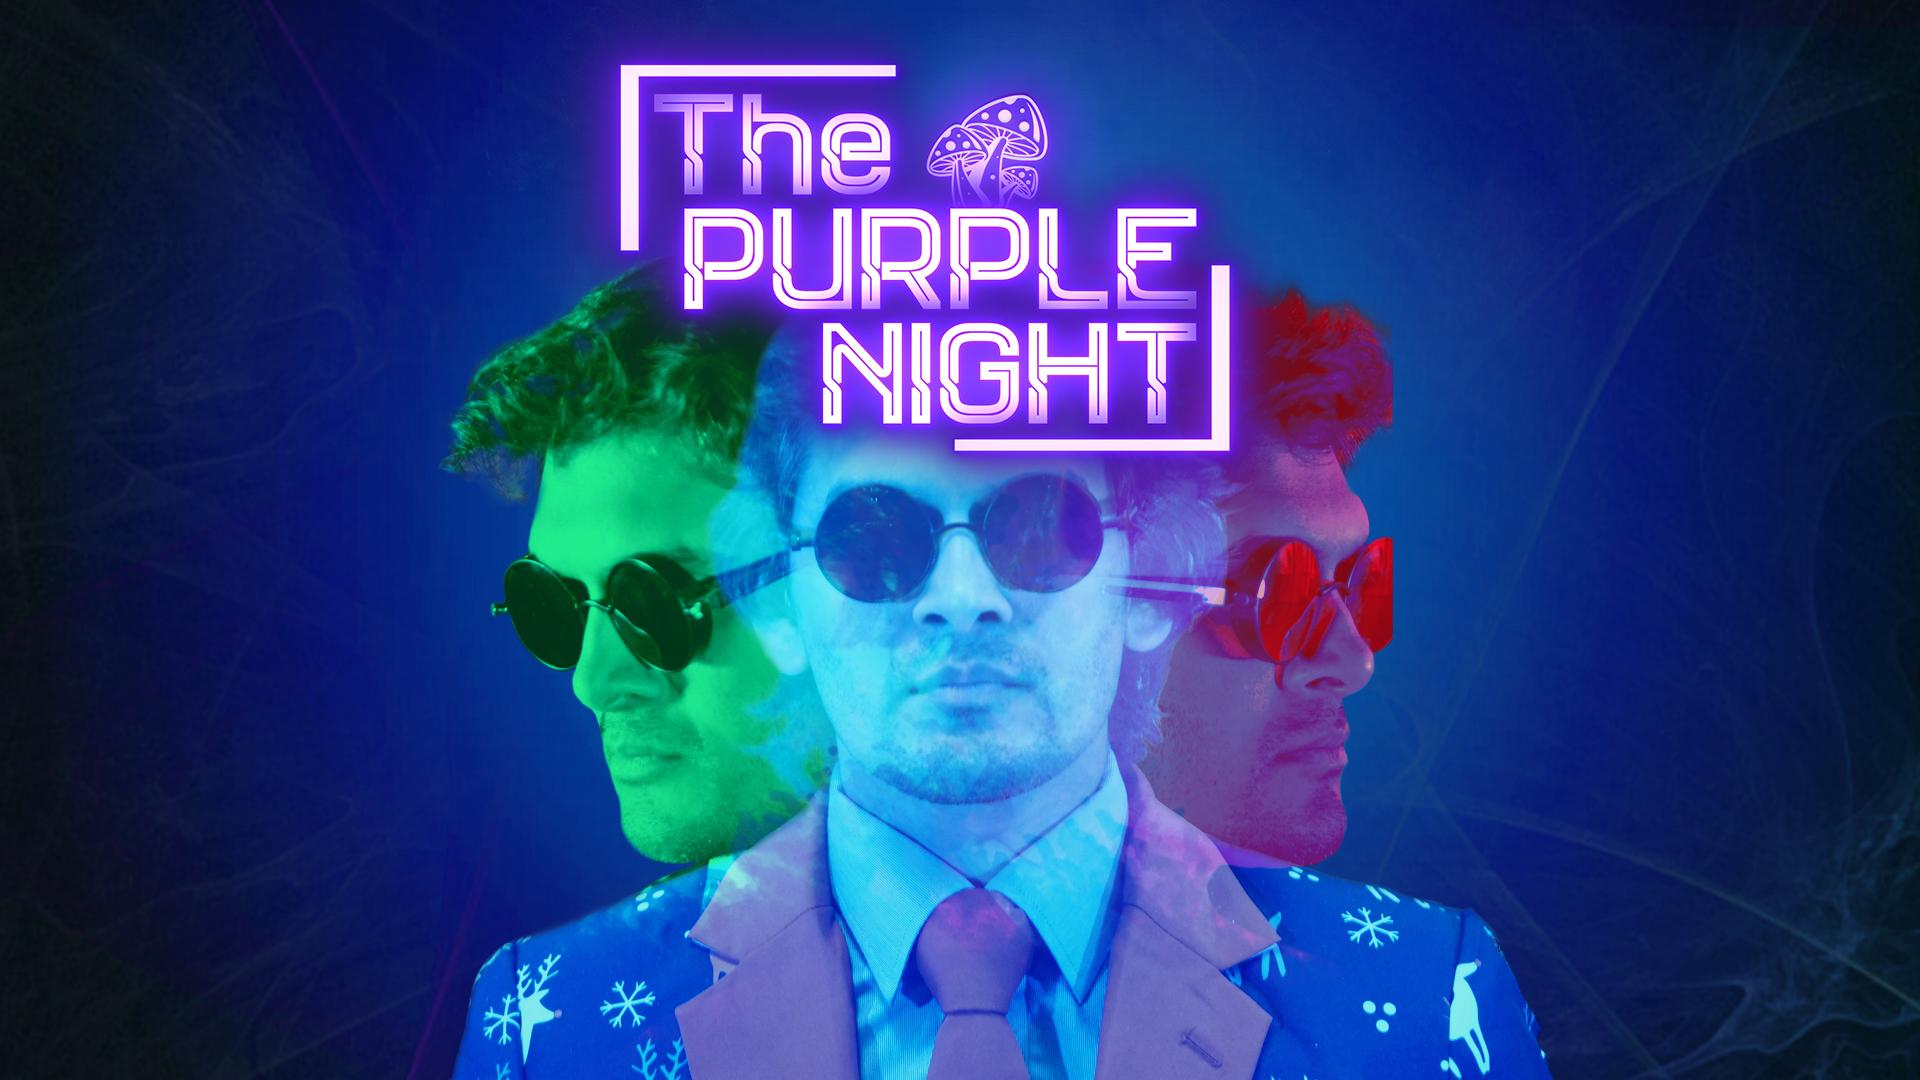 The Purple Night